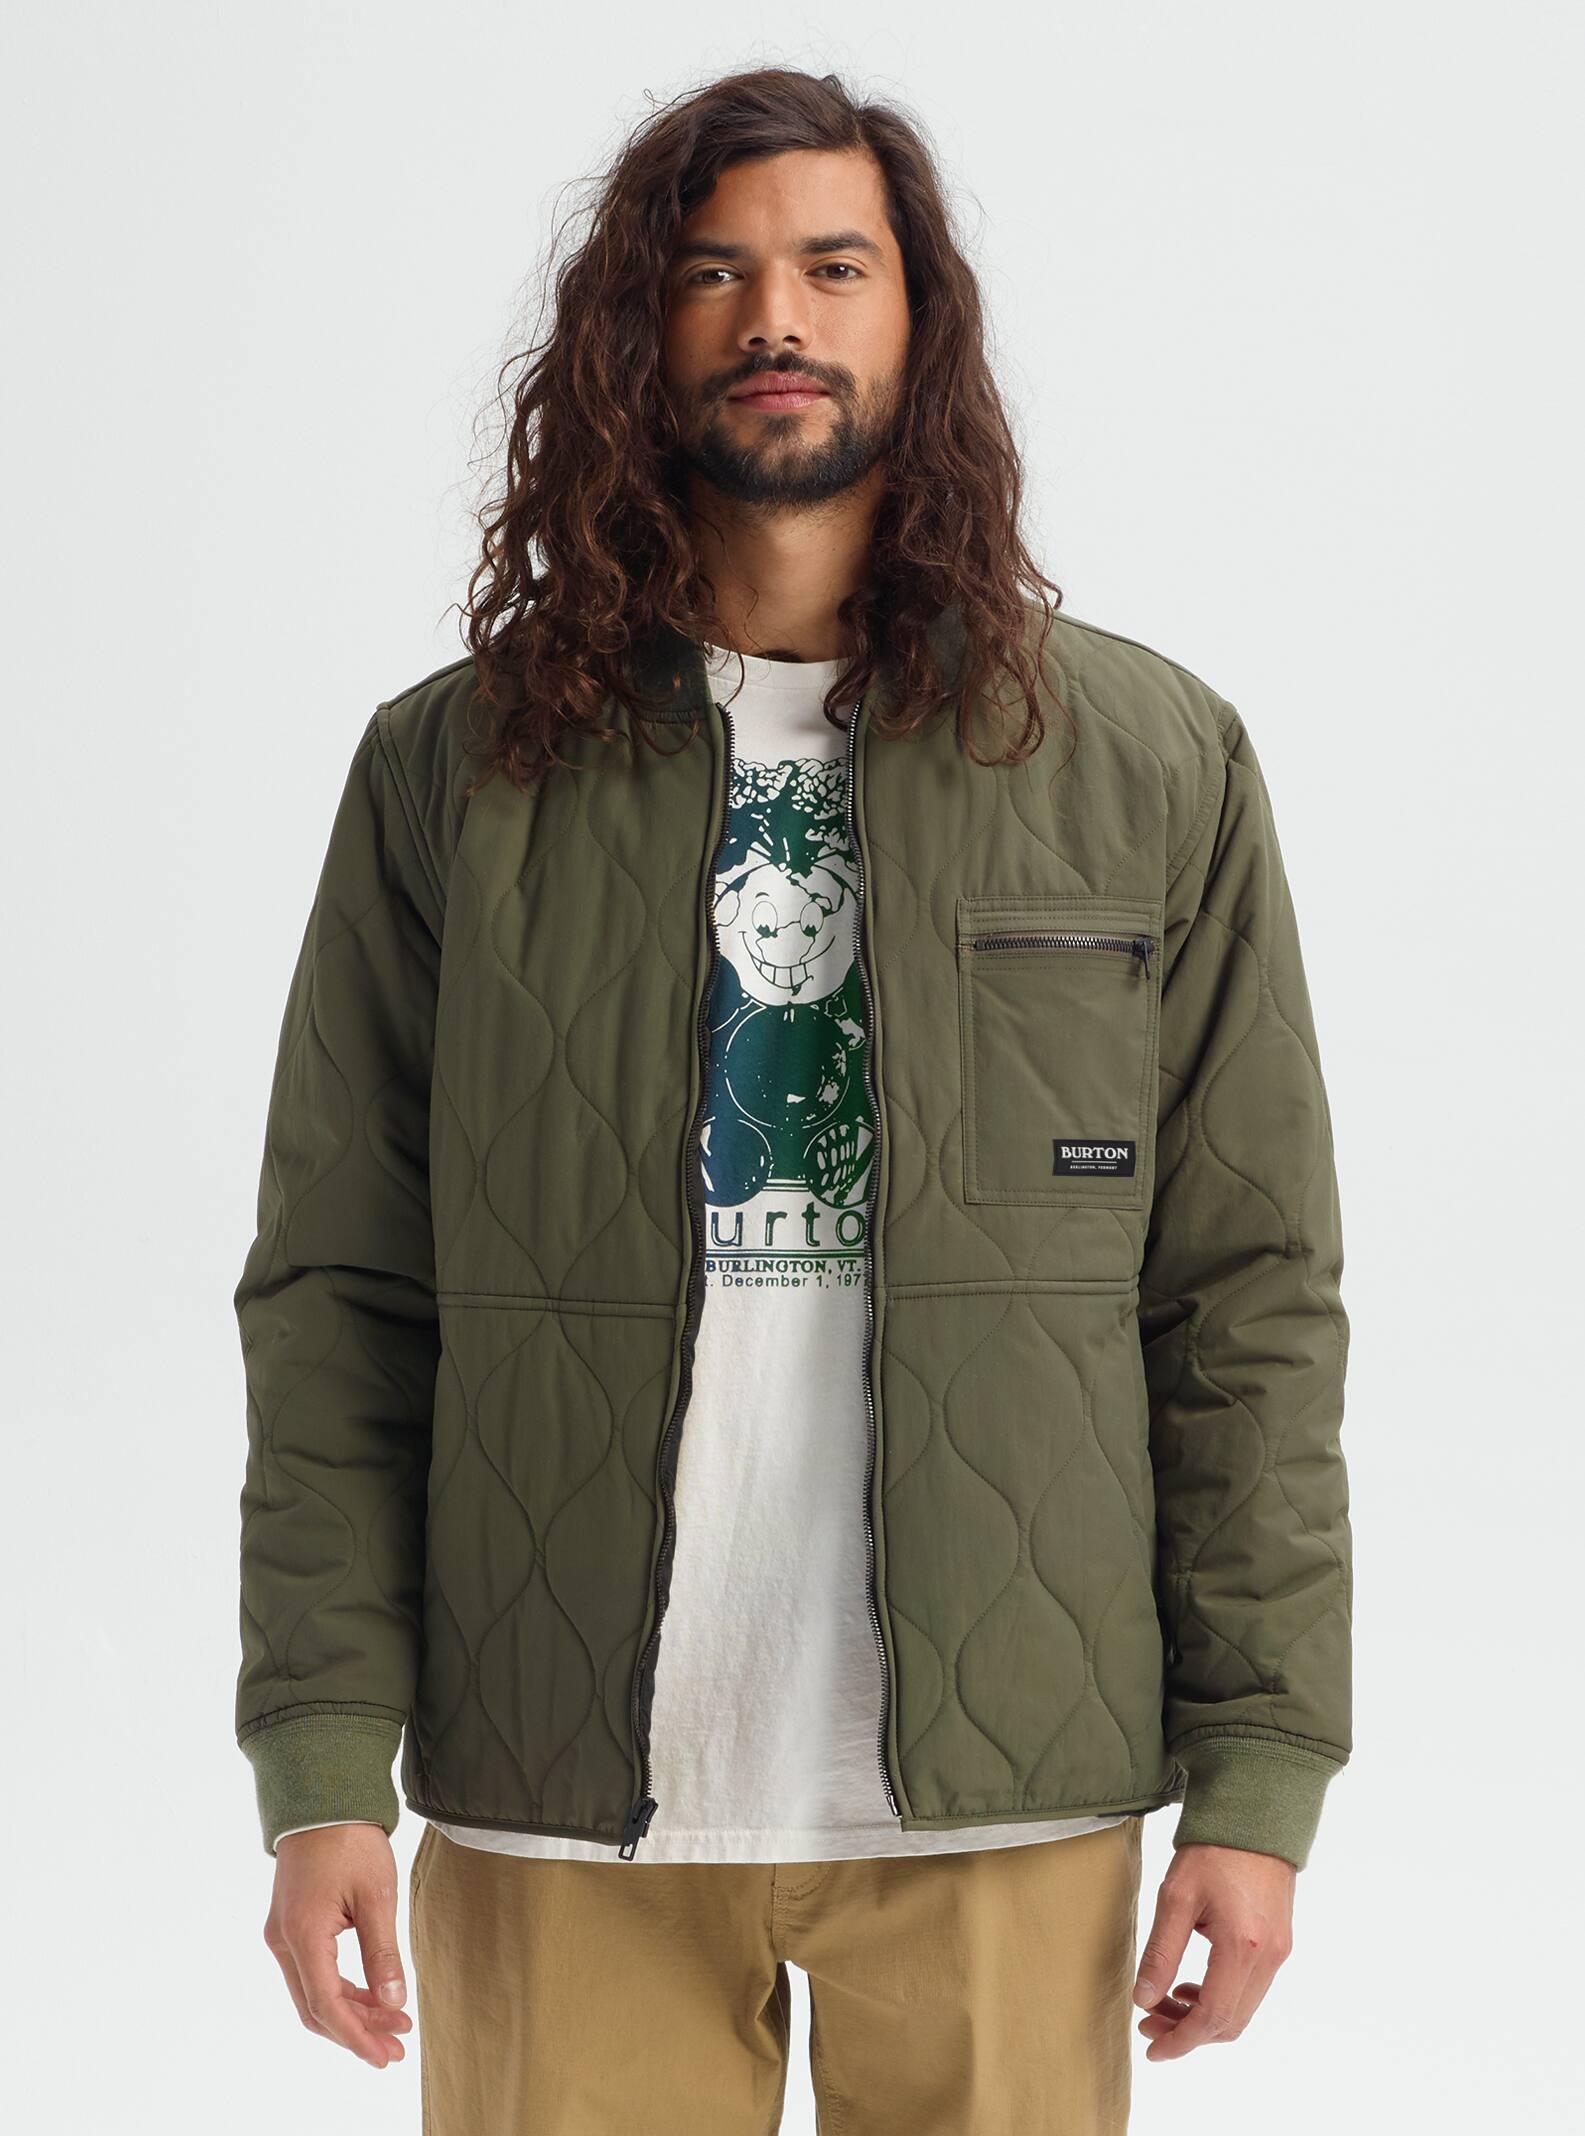 eec49a42 Men's Jackets & Outerwear | Burton Snowboards